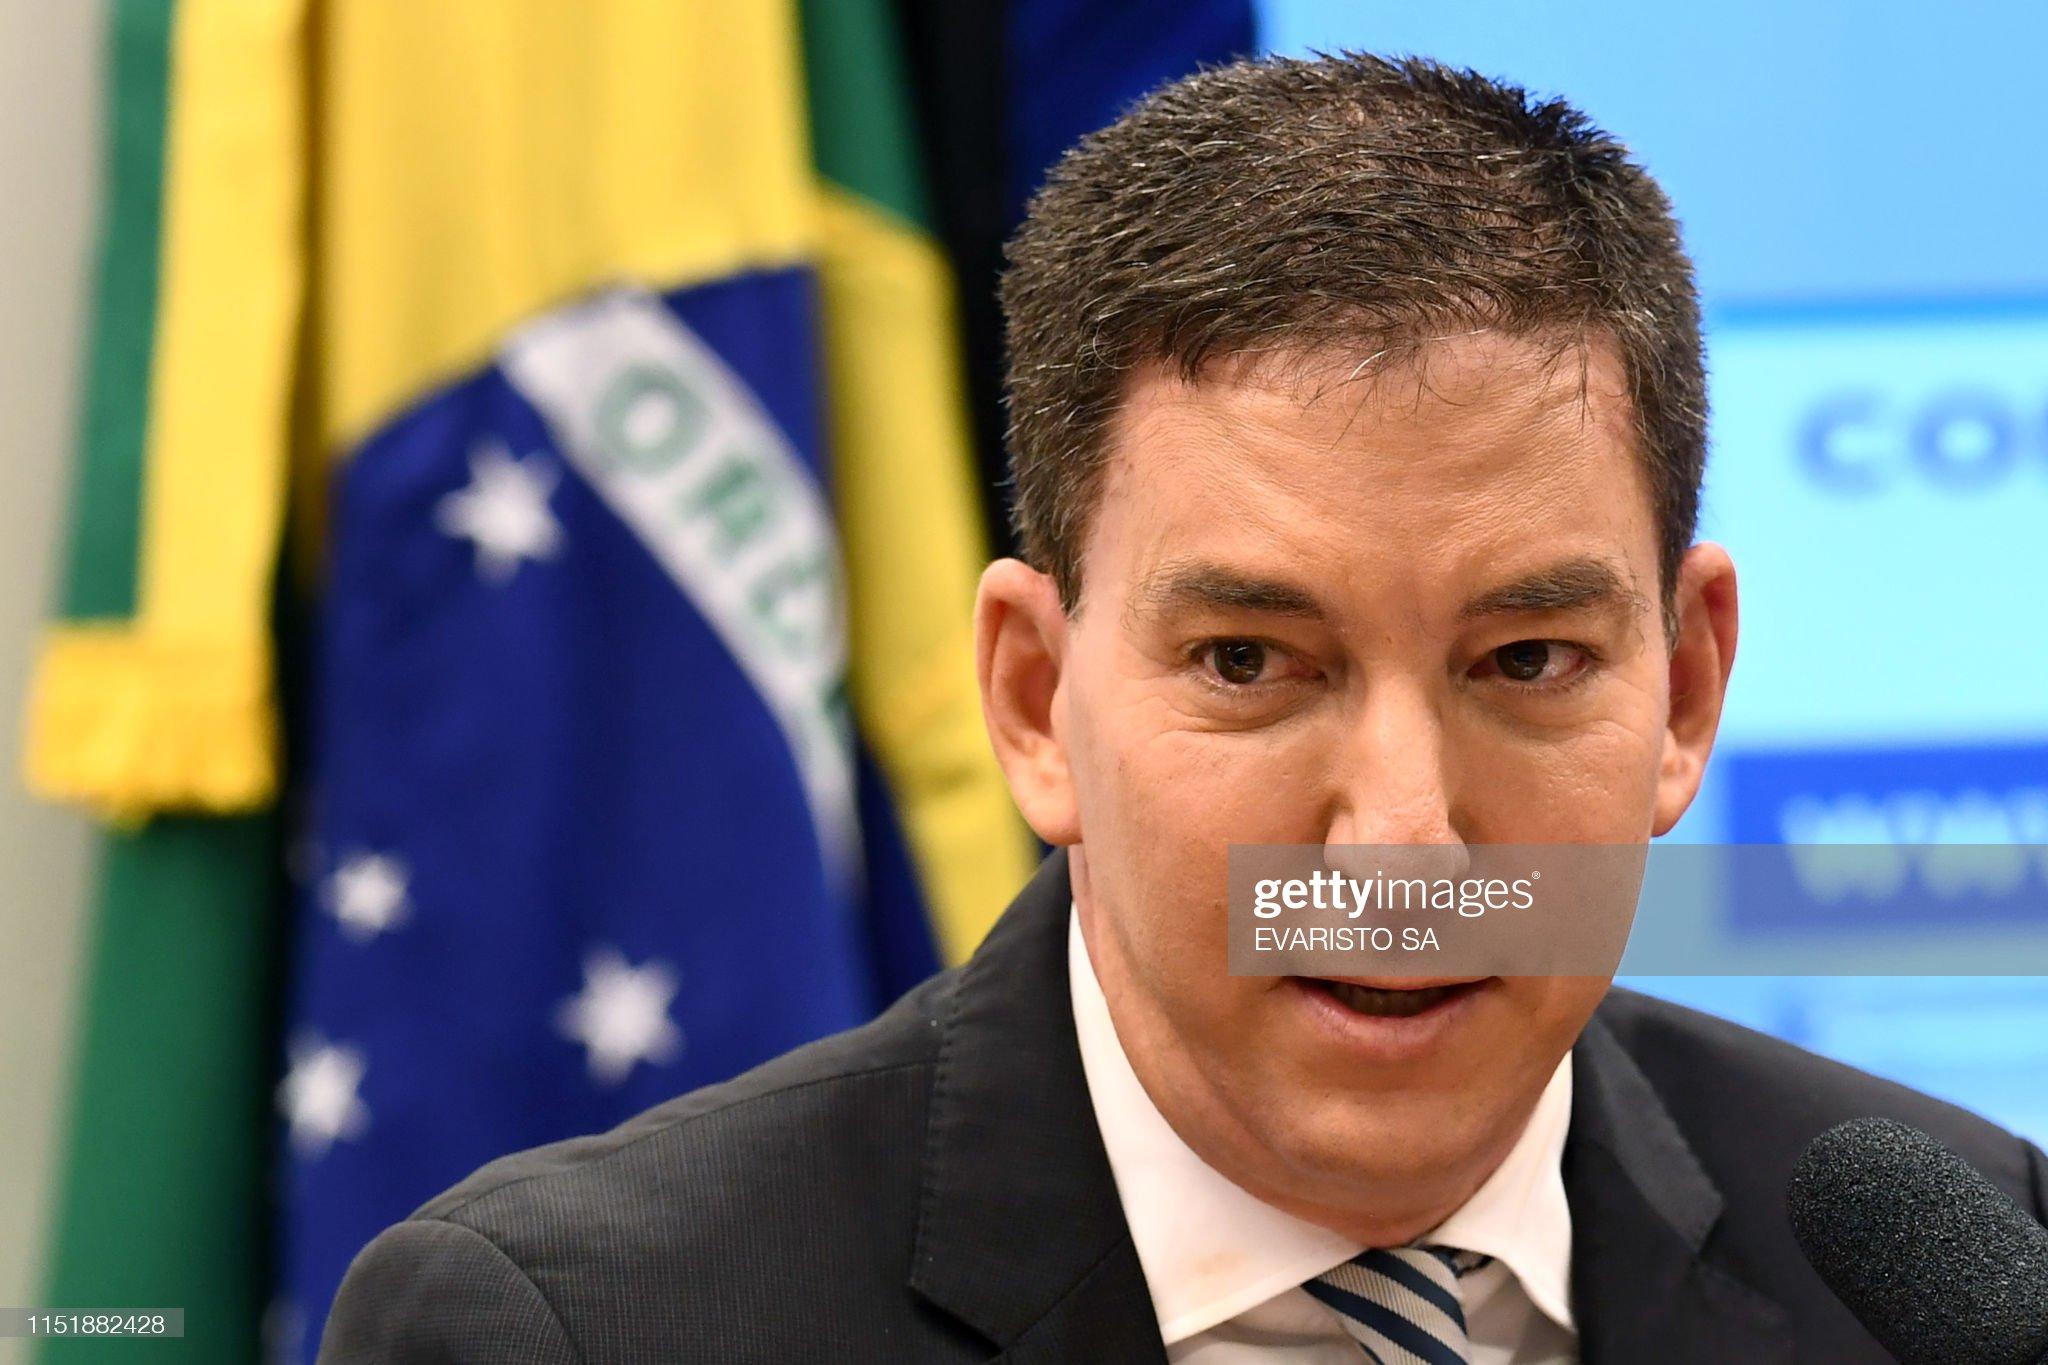 BRAZIL-POLITICS-CORRUPTION-INTERCEPT-GREENWALD : News Photo